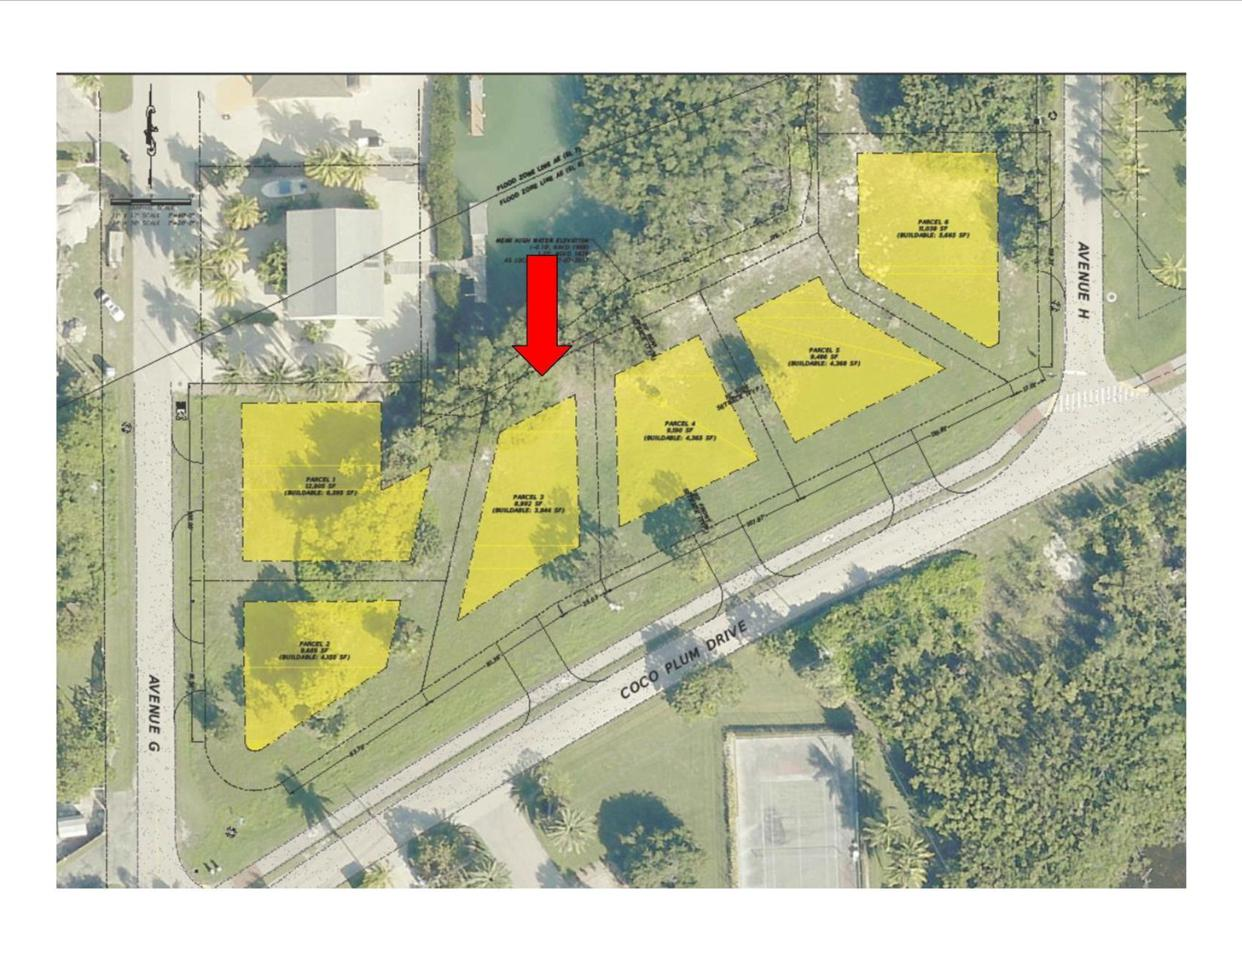 Marathon Florida Map.132 Coco Plum Drive Marathon Fl 33050 Mls 582861 Be In Key